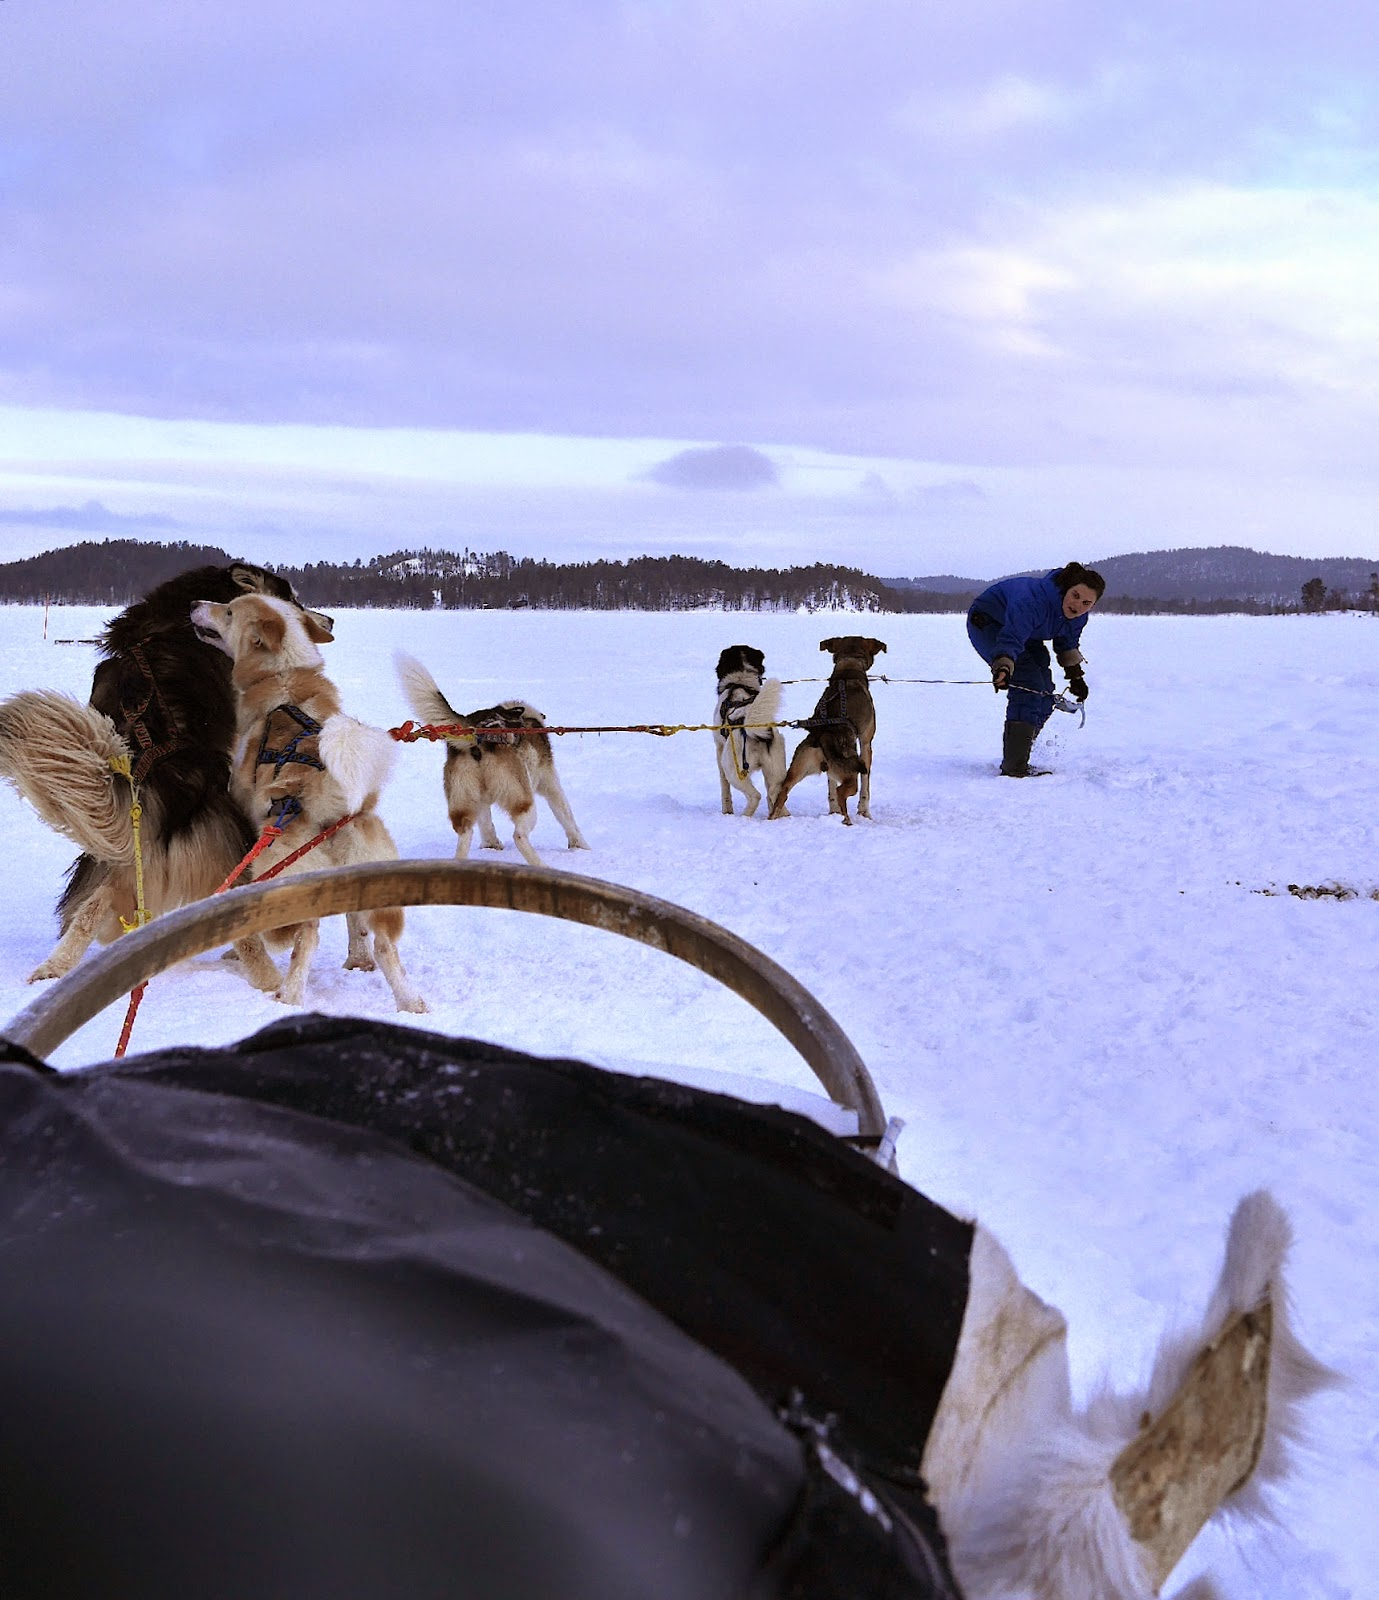 Husky Sled, Finland